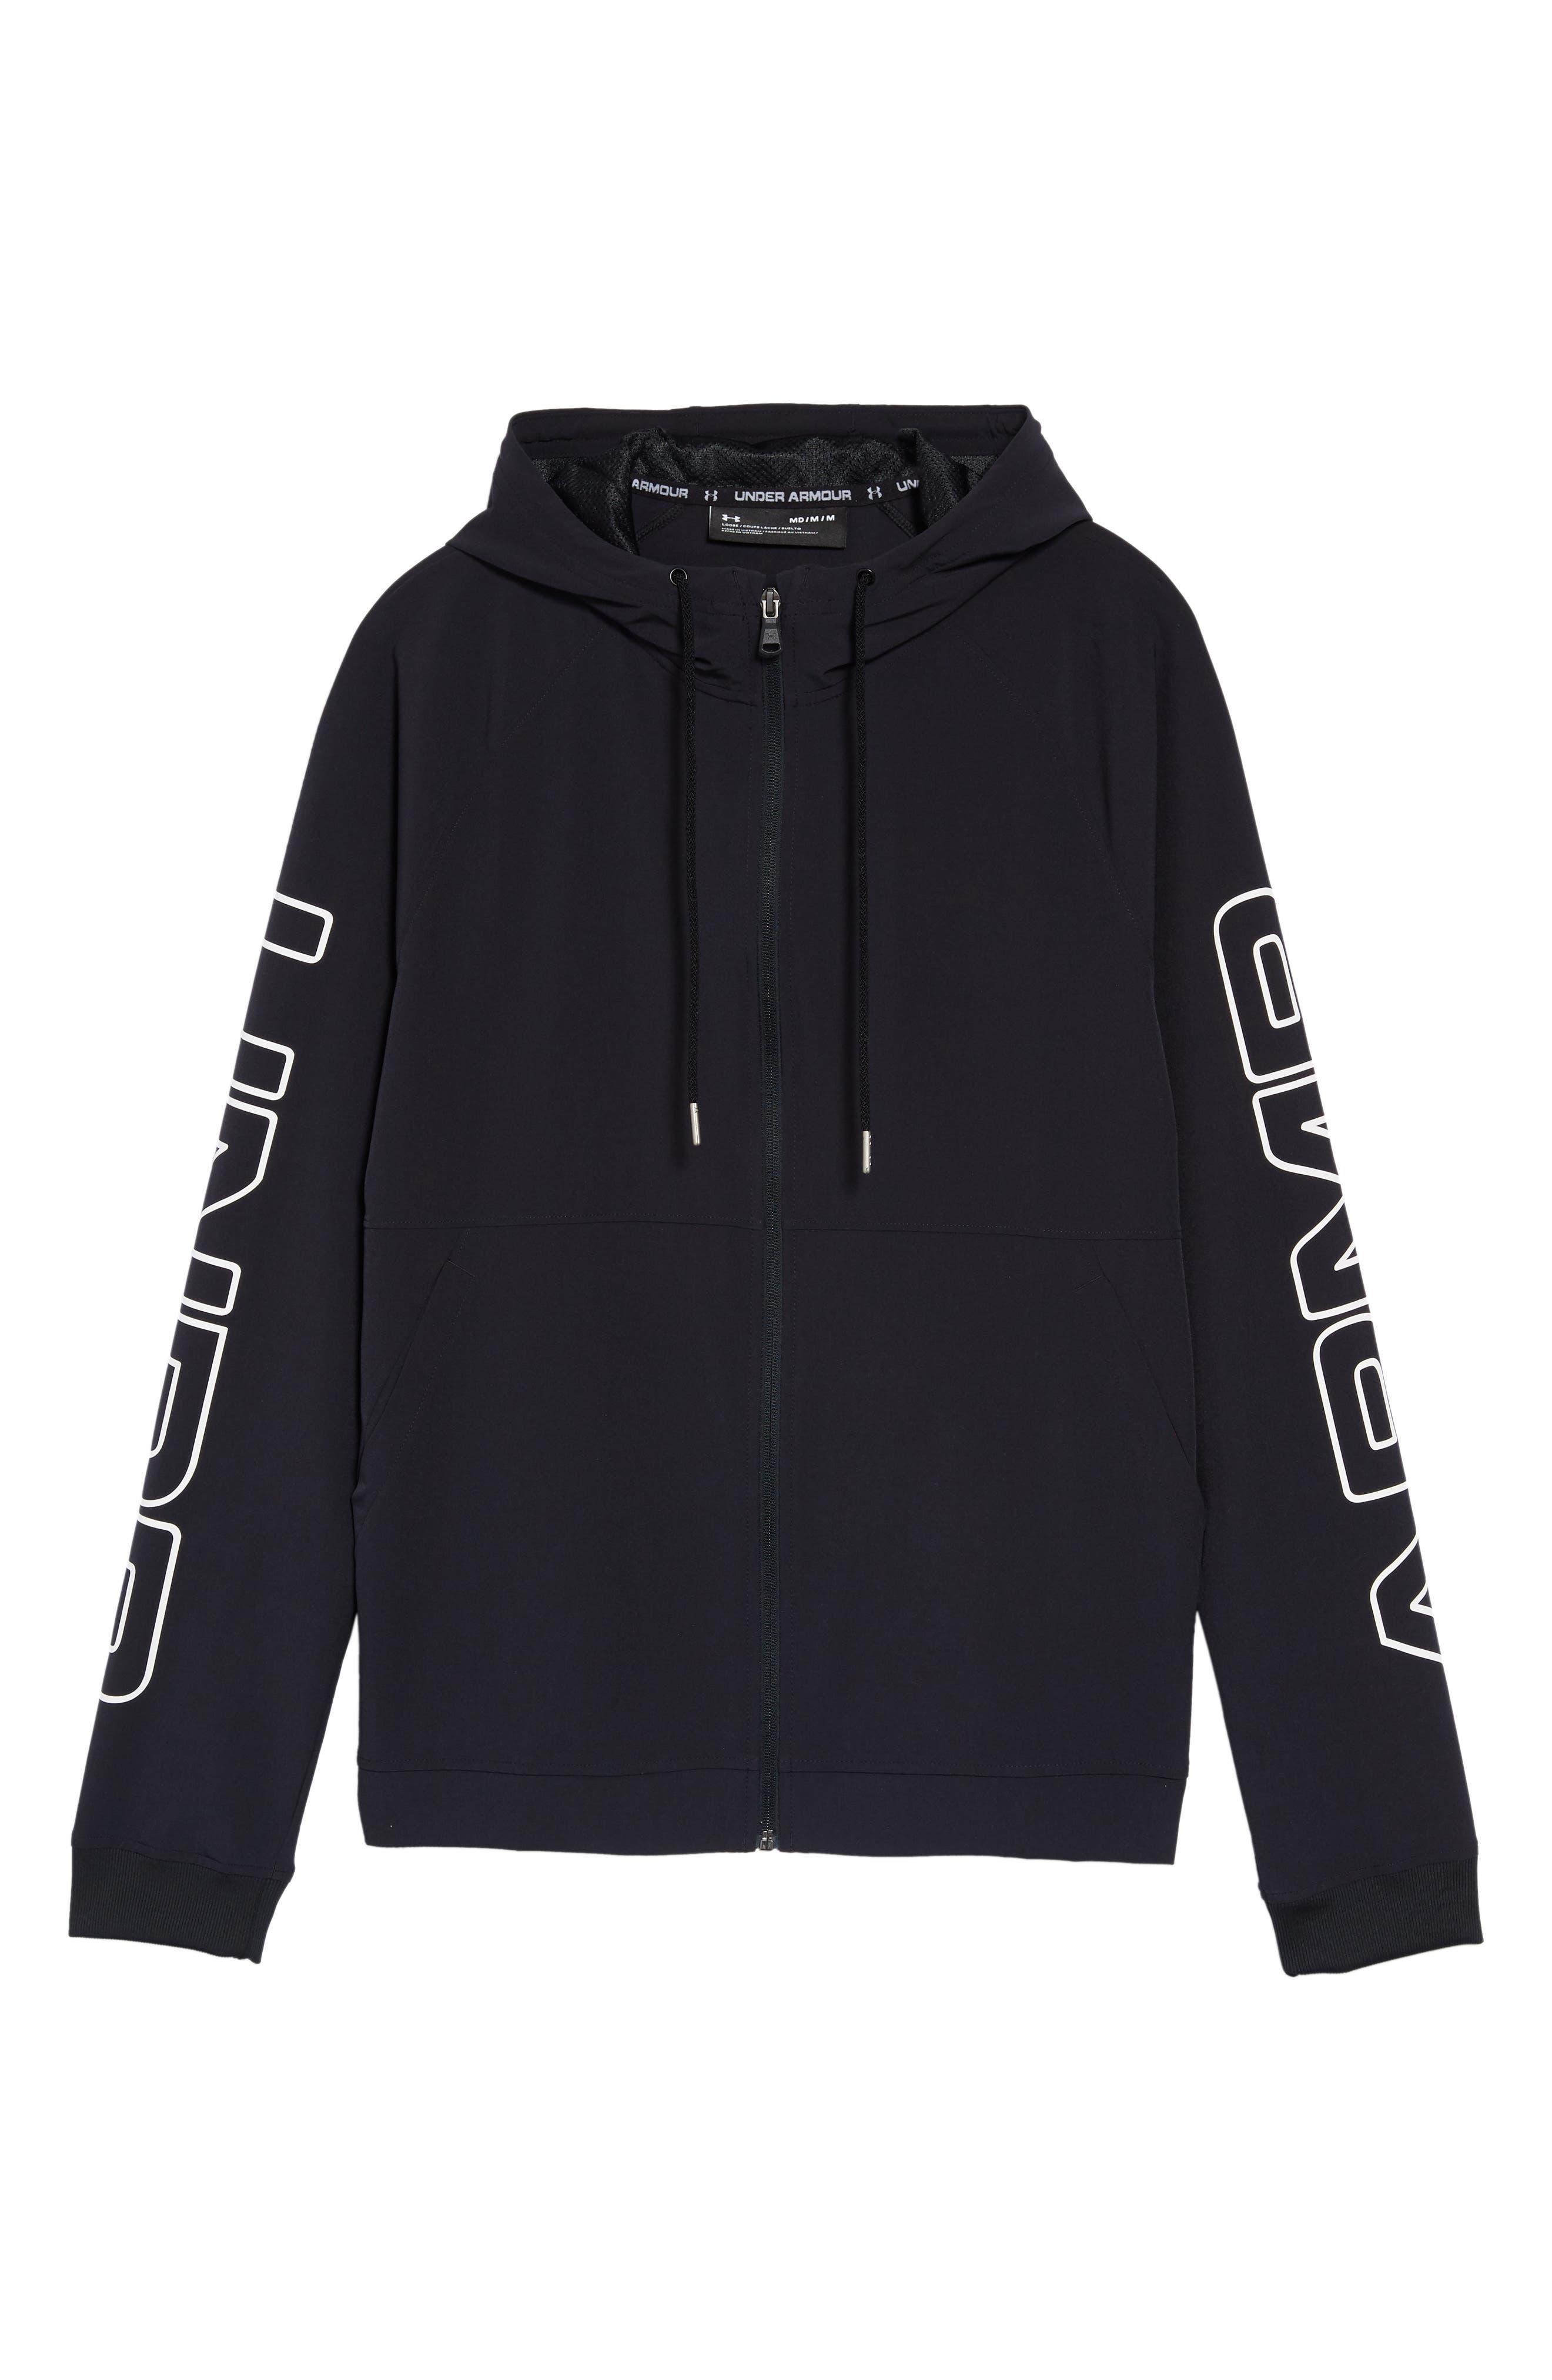 Baseline Hooded Jacket,                             Alternate thumbnail 6, color,                             BLACK